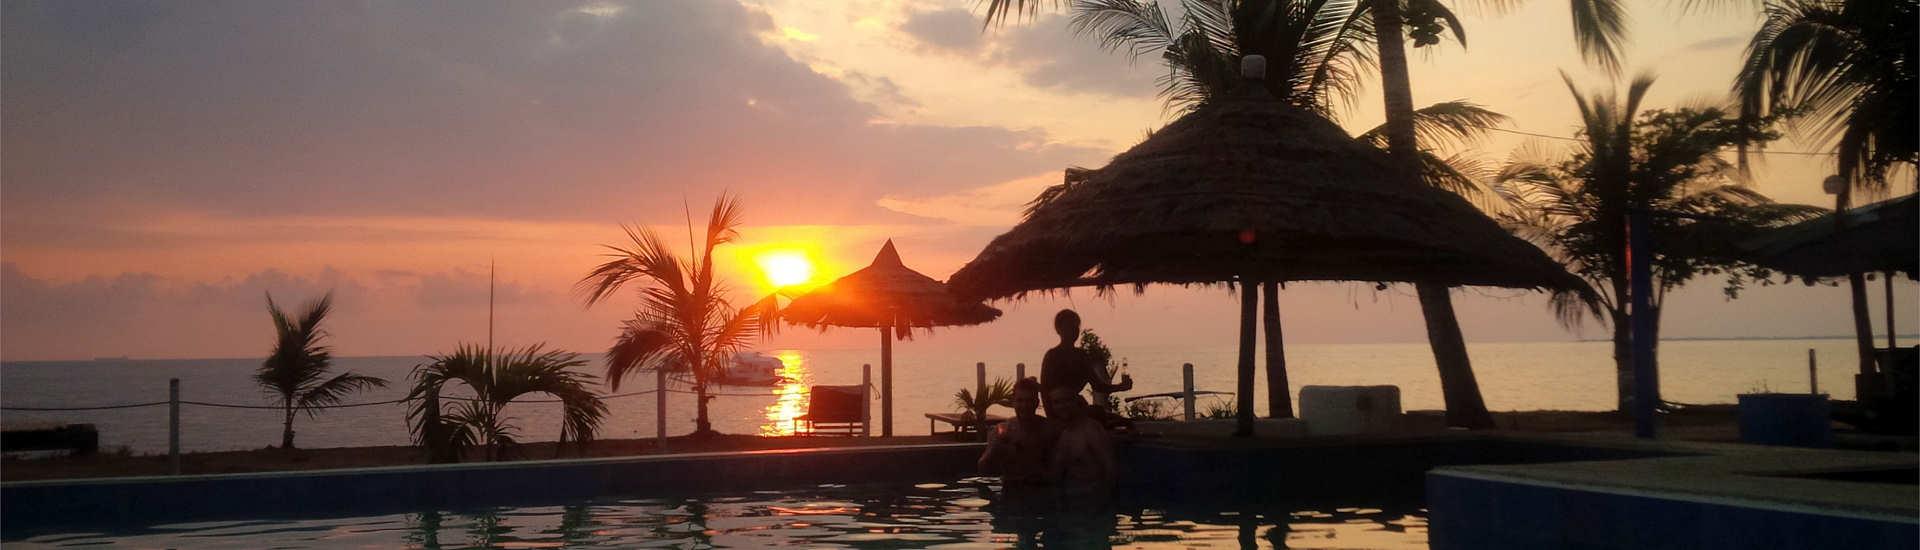 Sonnenuntergang auf Mindoro